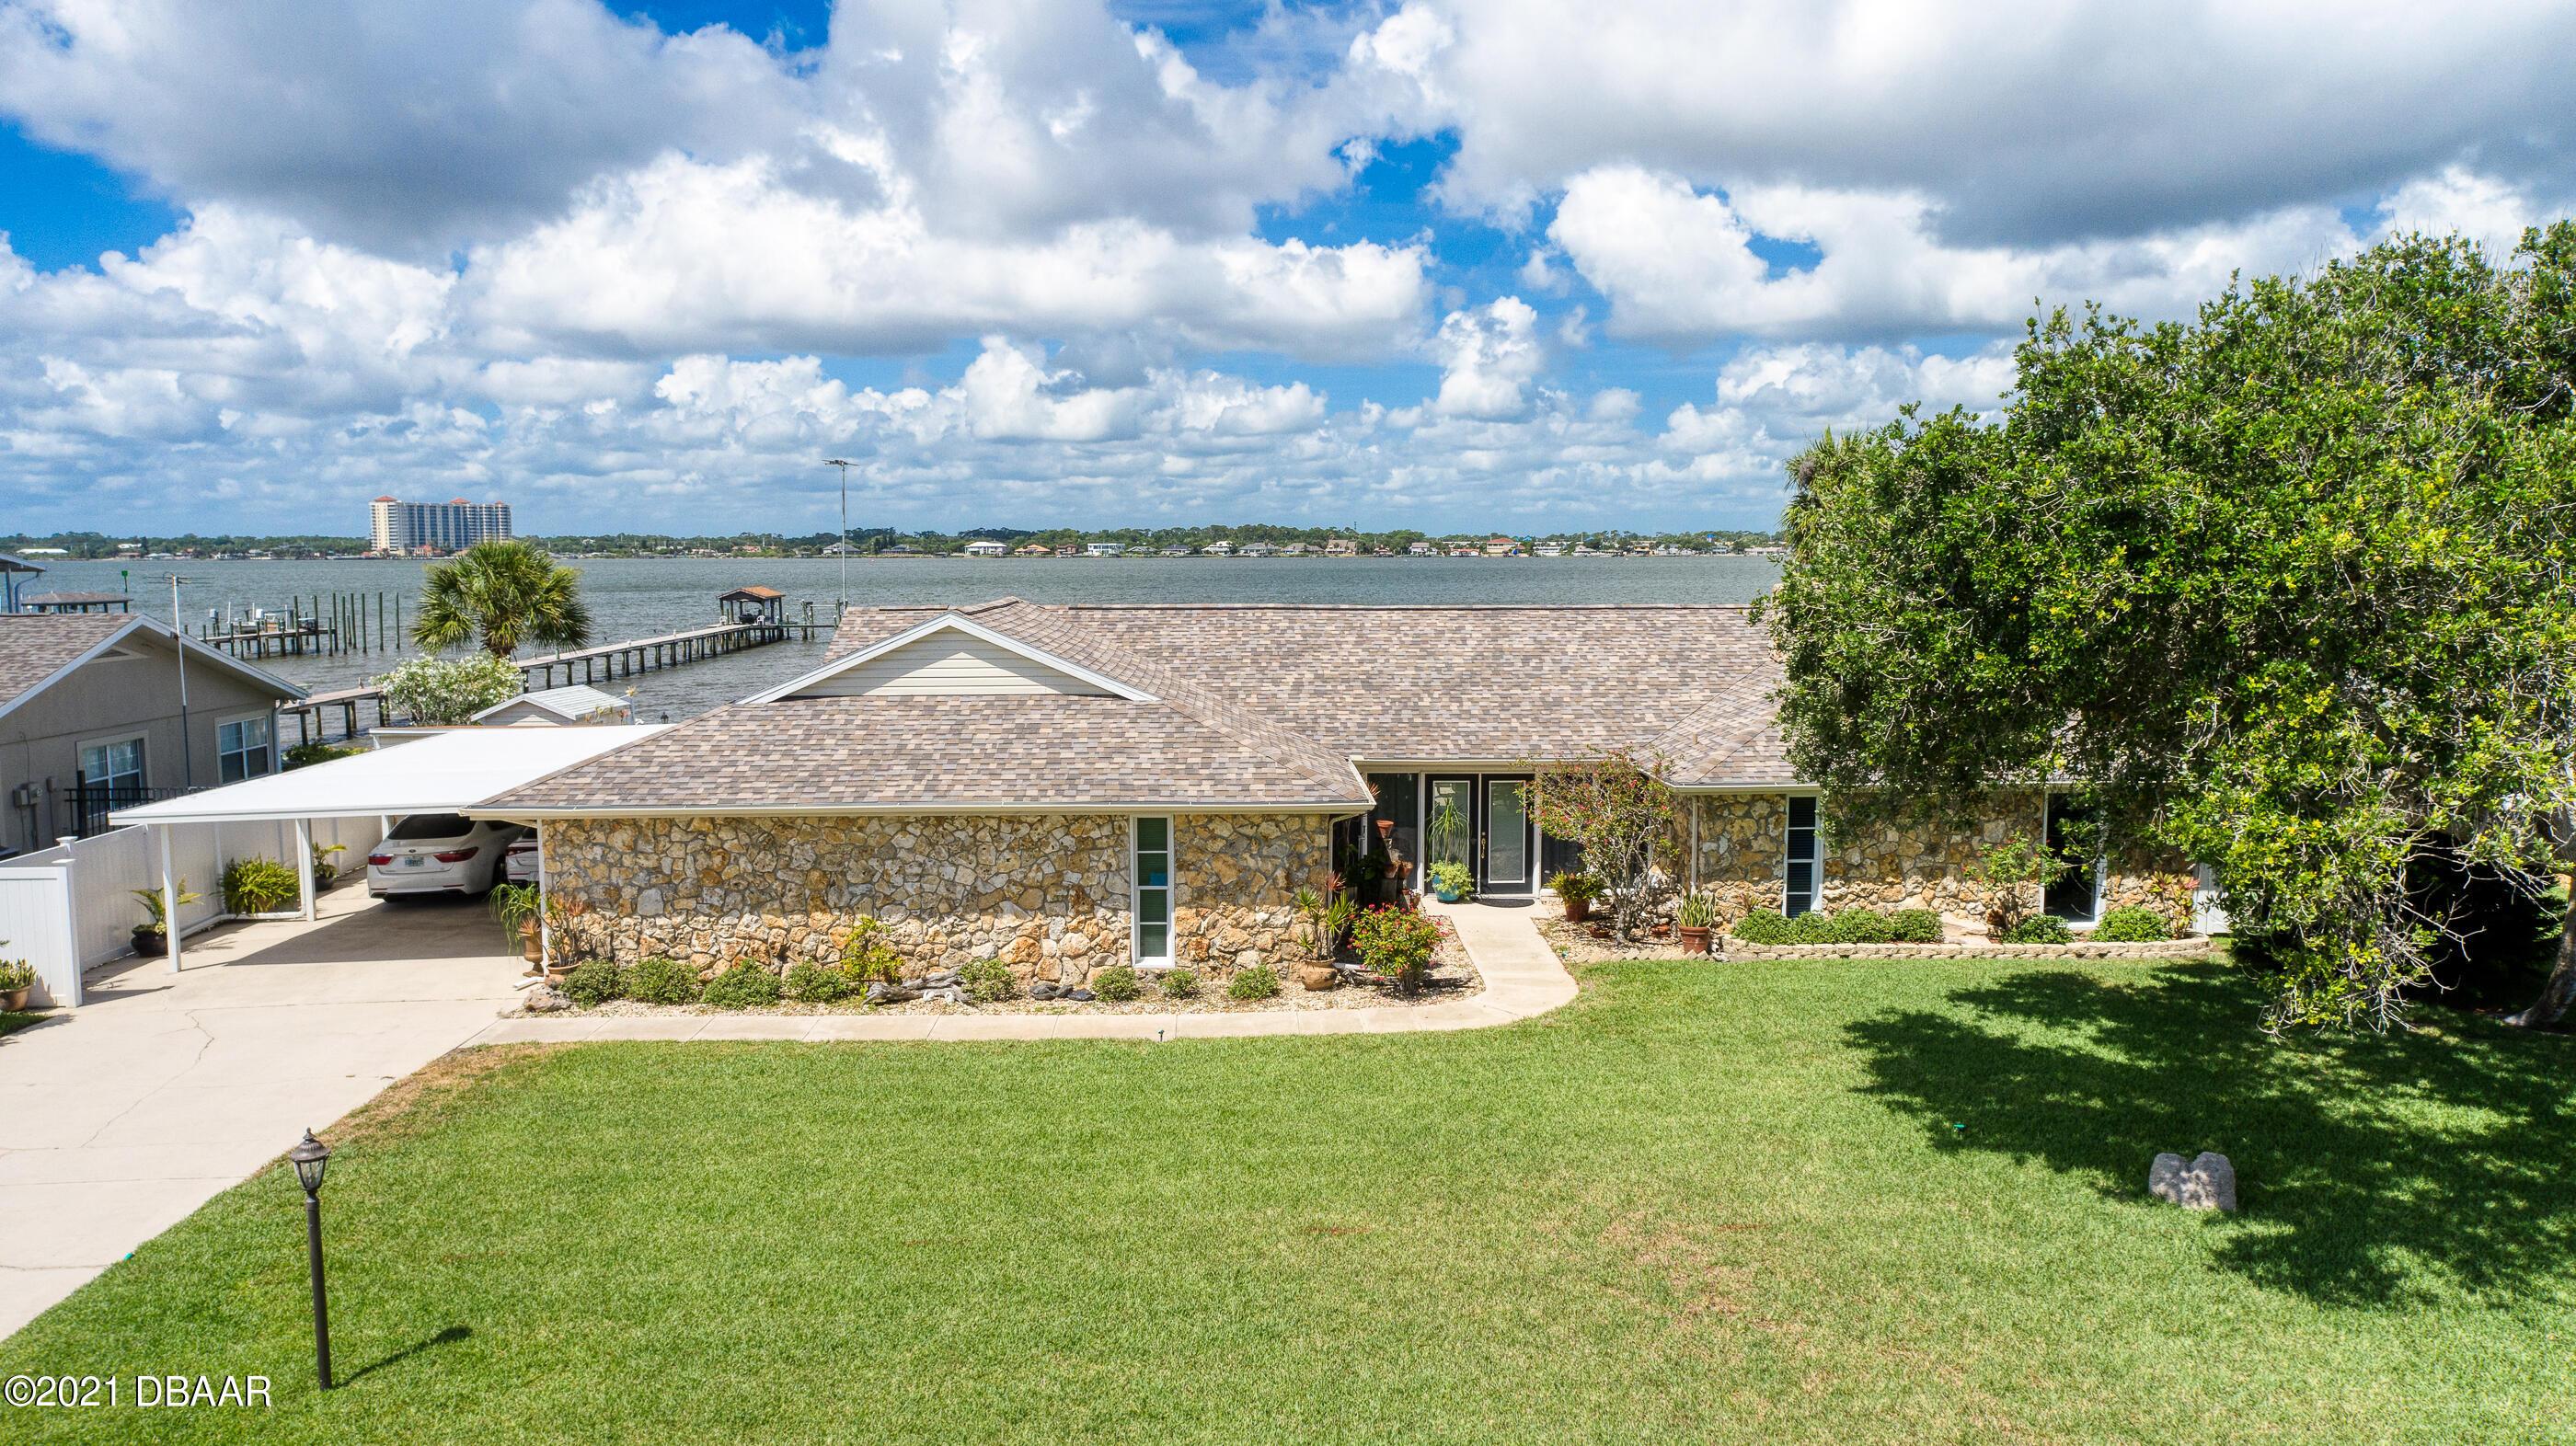 Photo of 2912 River Point Drive, Daytona Beach, FL 32118